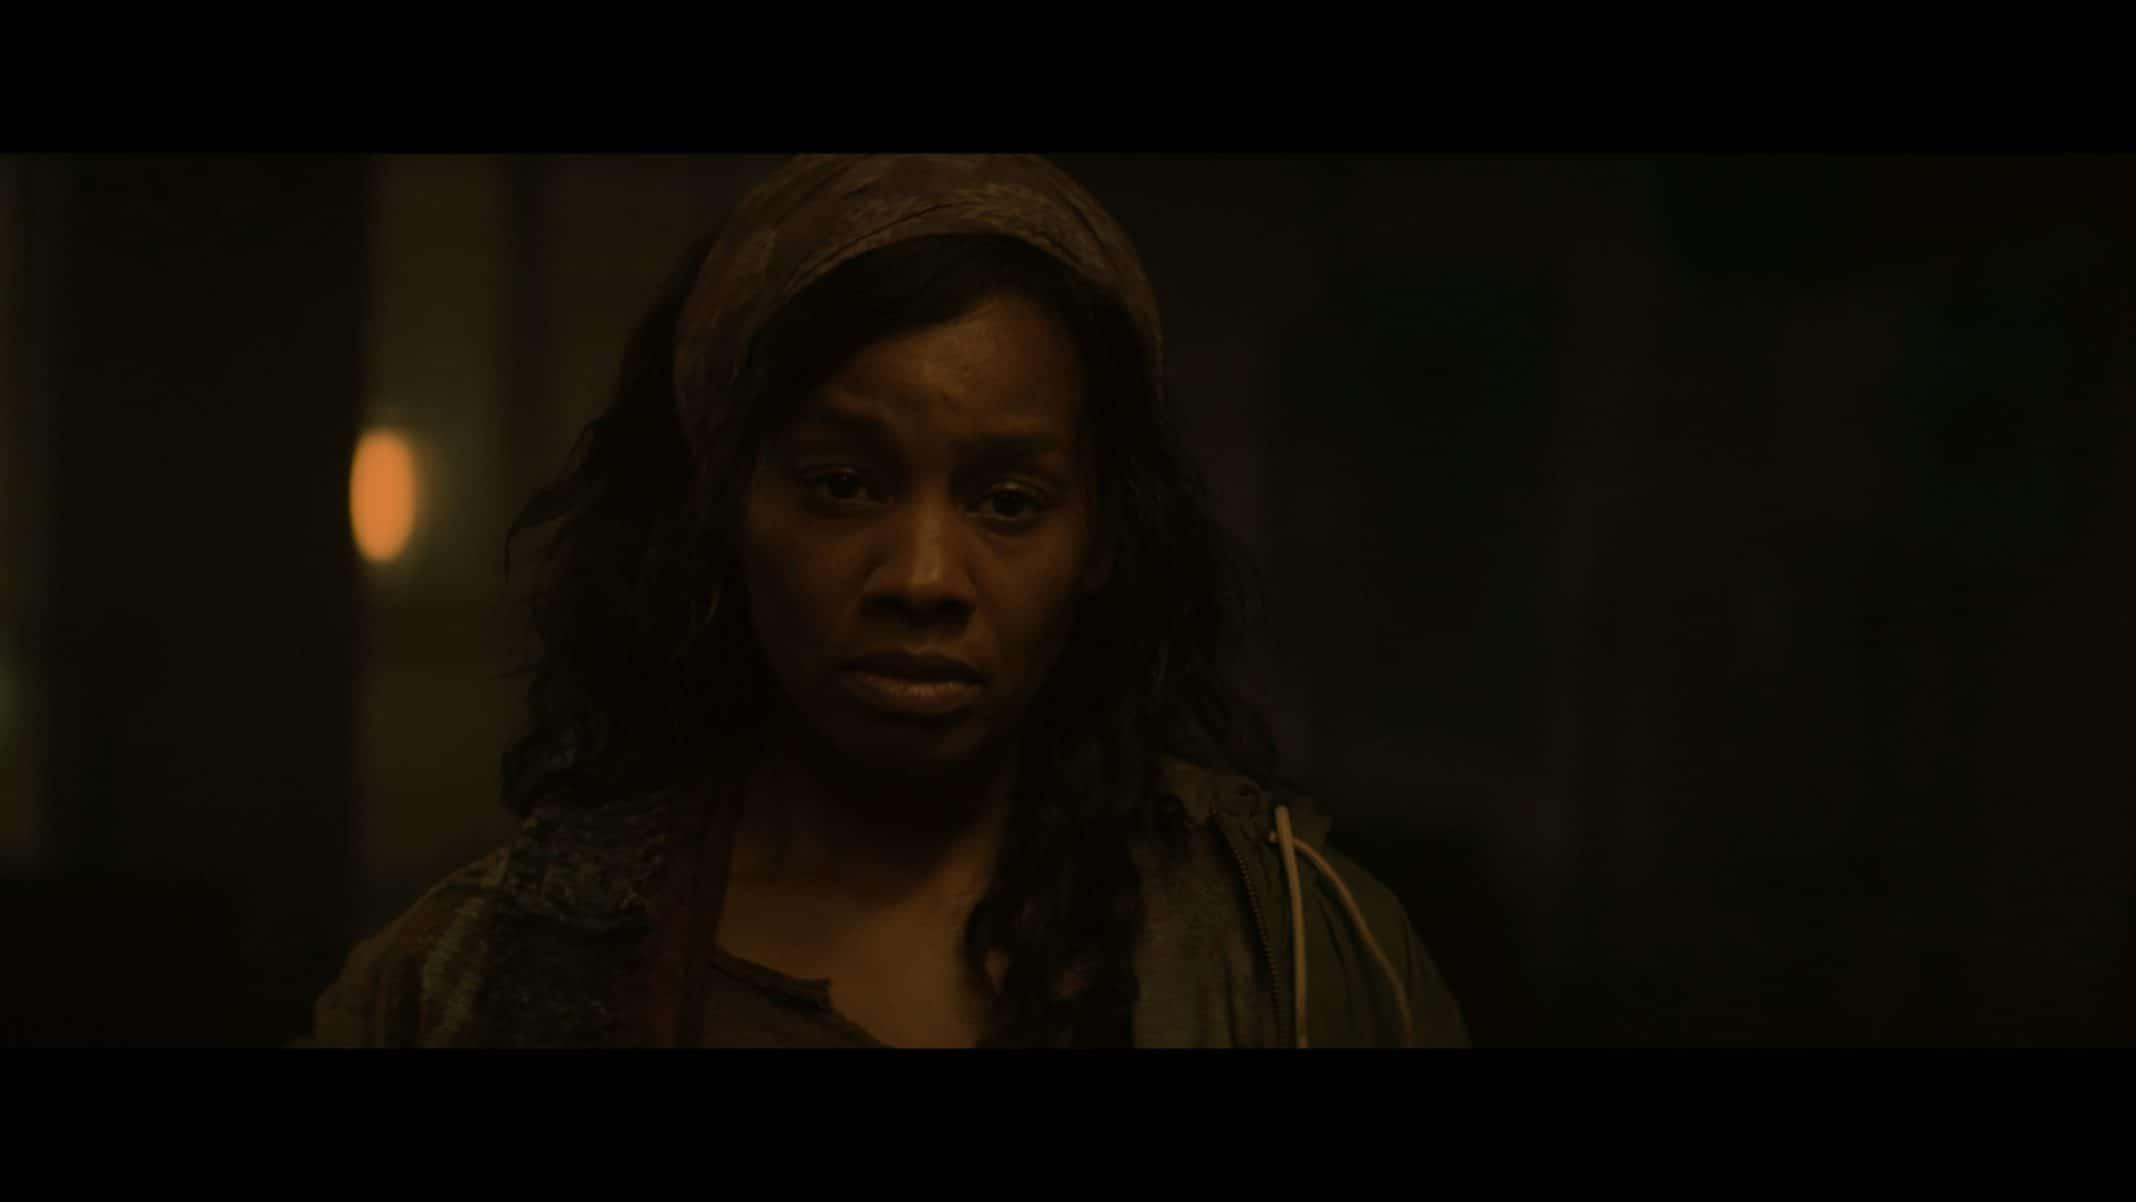 Taneesha (Anika Noni Rose) looking exasperated.